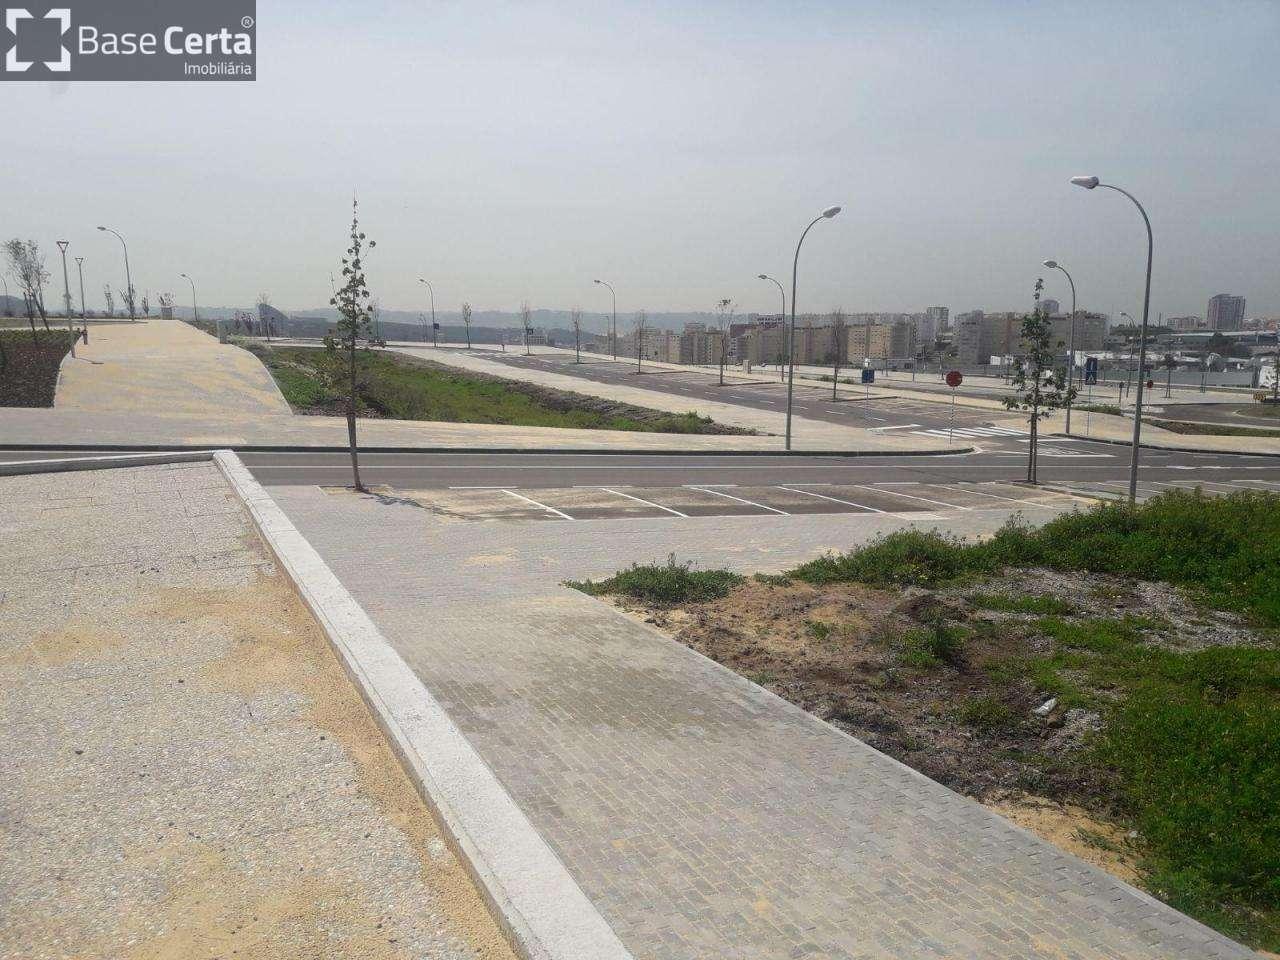 Terreno para comprar, Carnaxide e Queijas, Lisboa - Foto 2